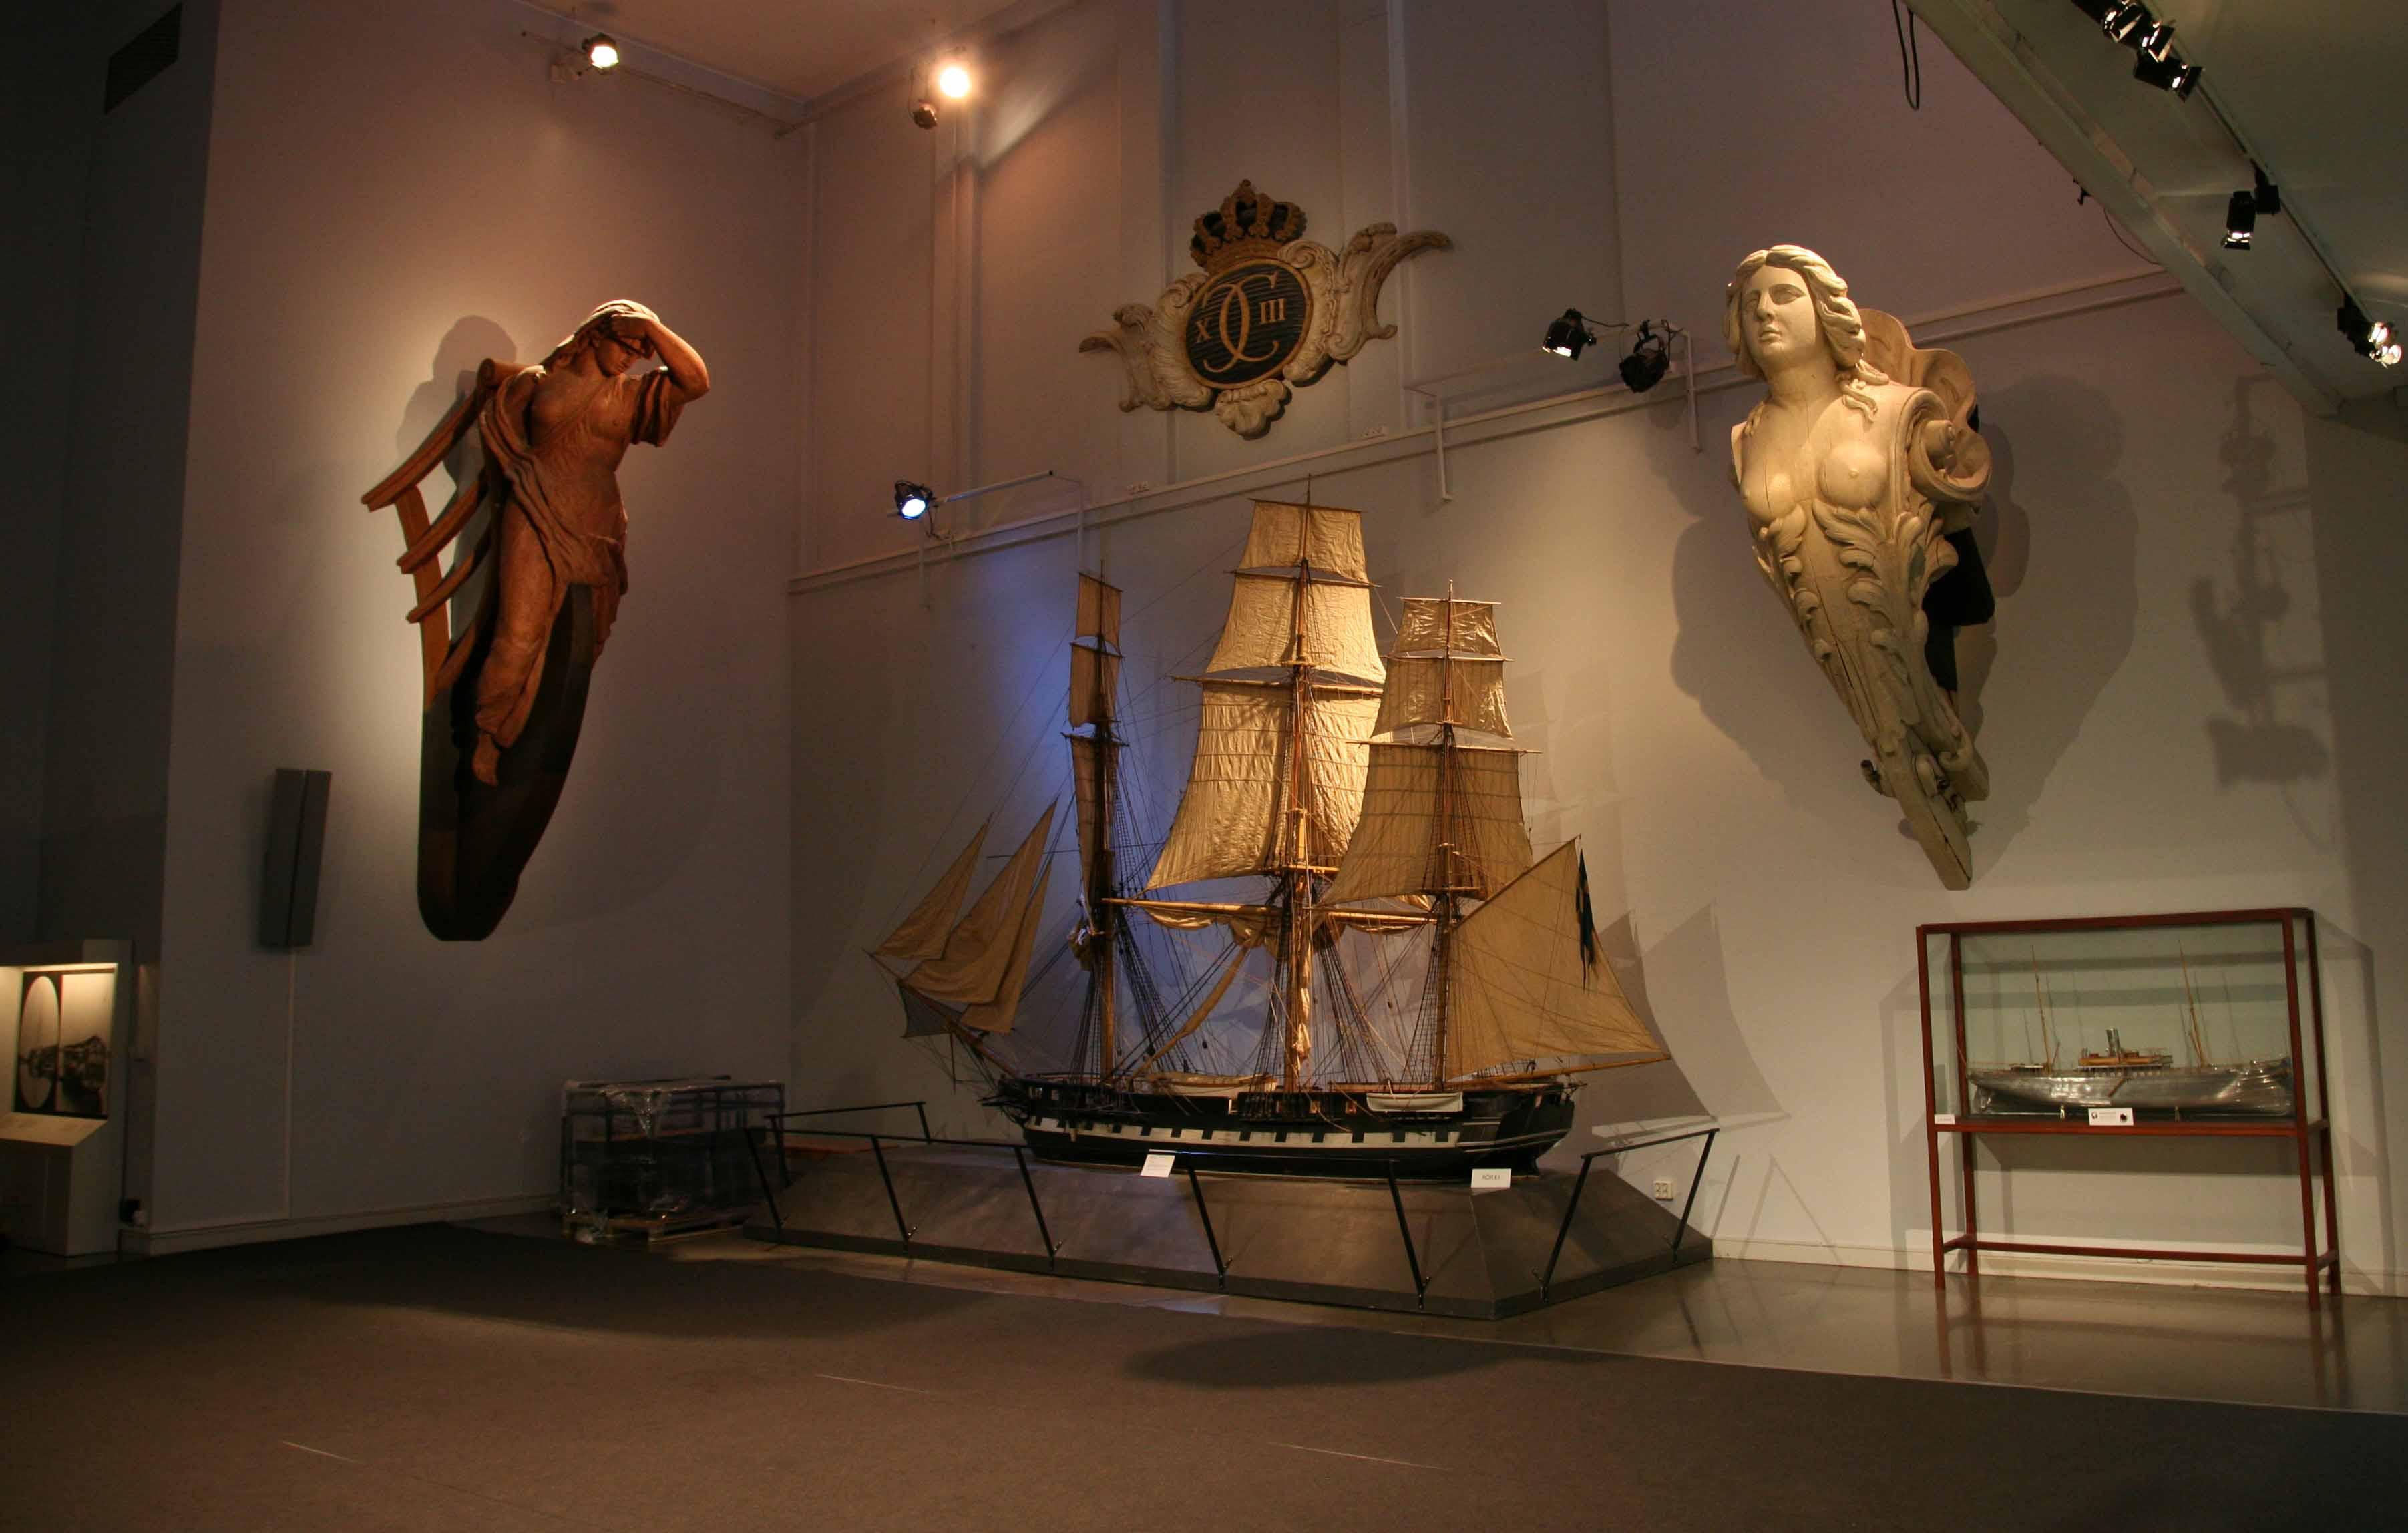 Sj 246 Historiska Museet The Maritime Museum In Stockholm